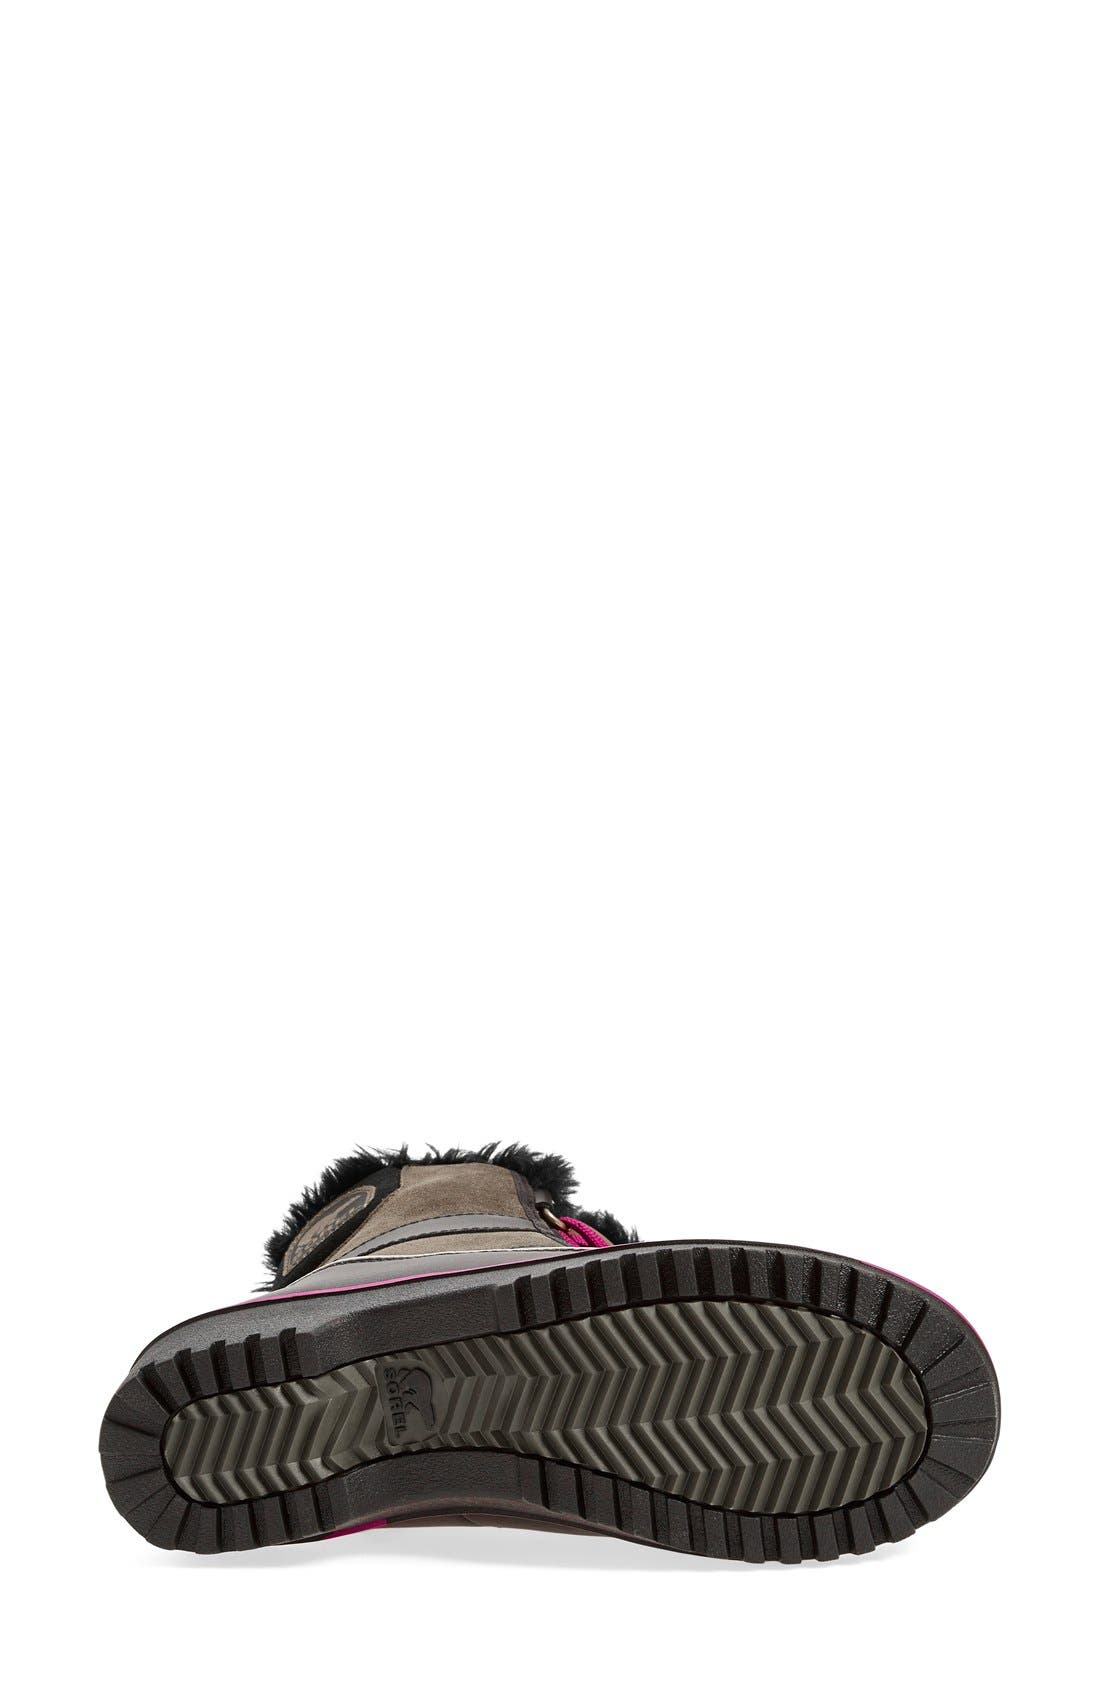 'Tivoli II' Waterproof Boot,                             Alternate thumbnail 42, color,